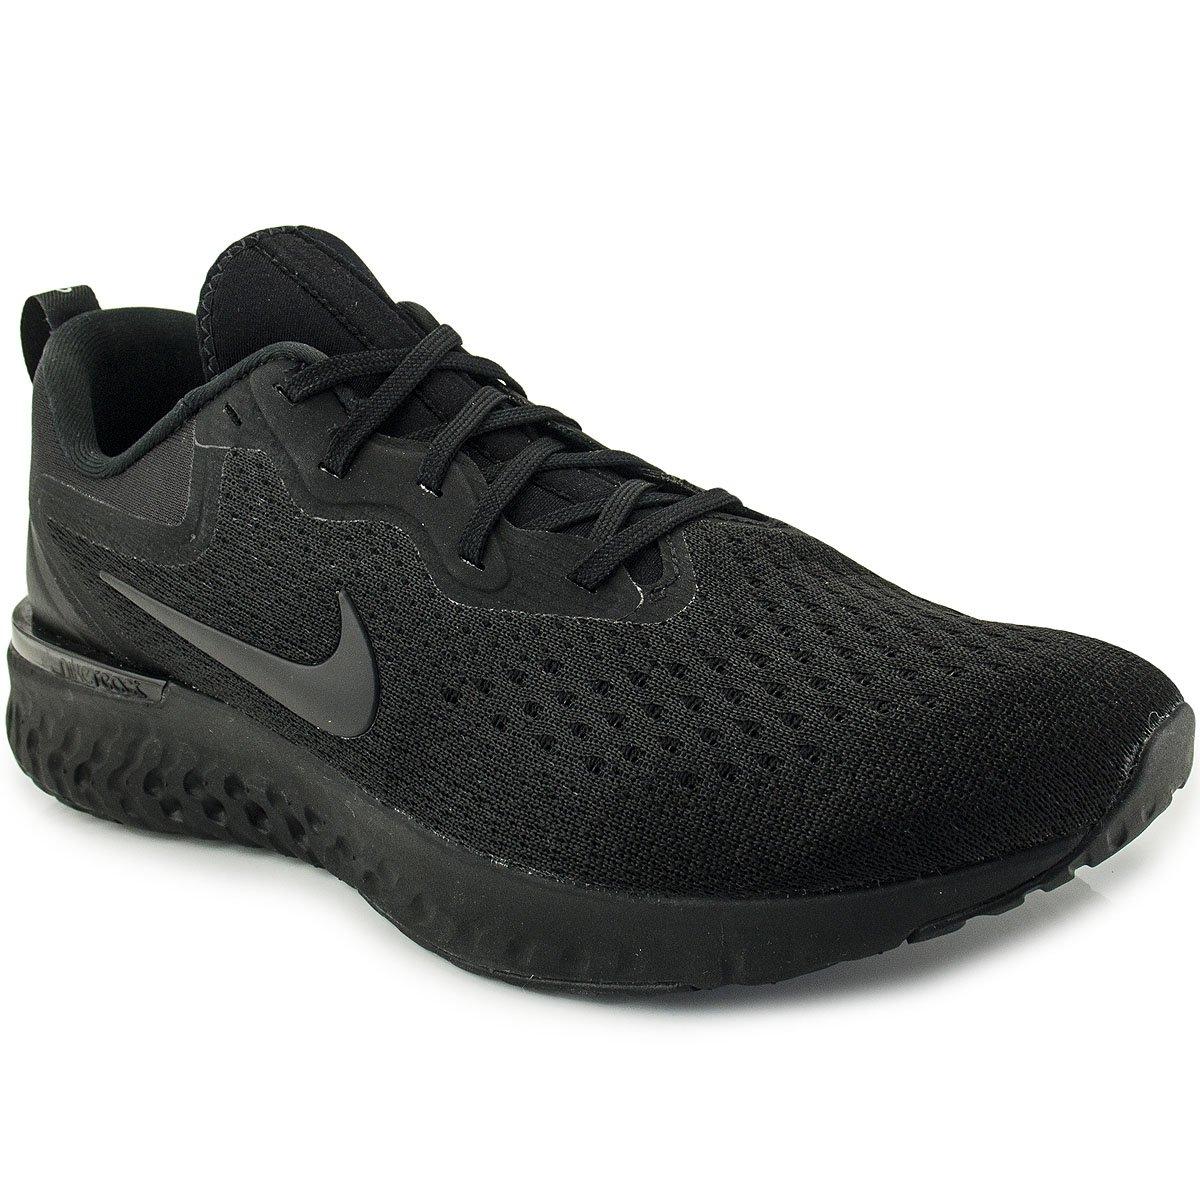 69b90250fe Tênis Nike Odyssey React Masculino AO9819